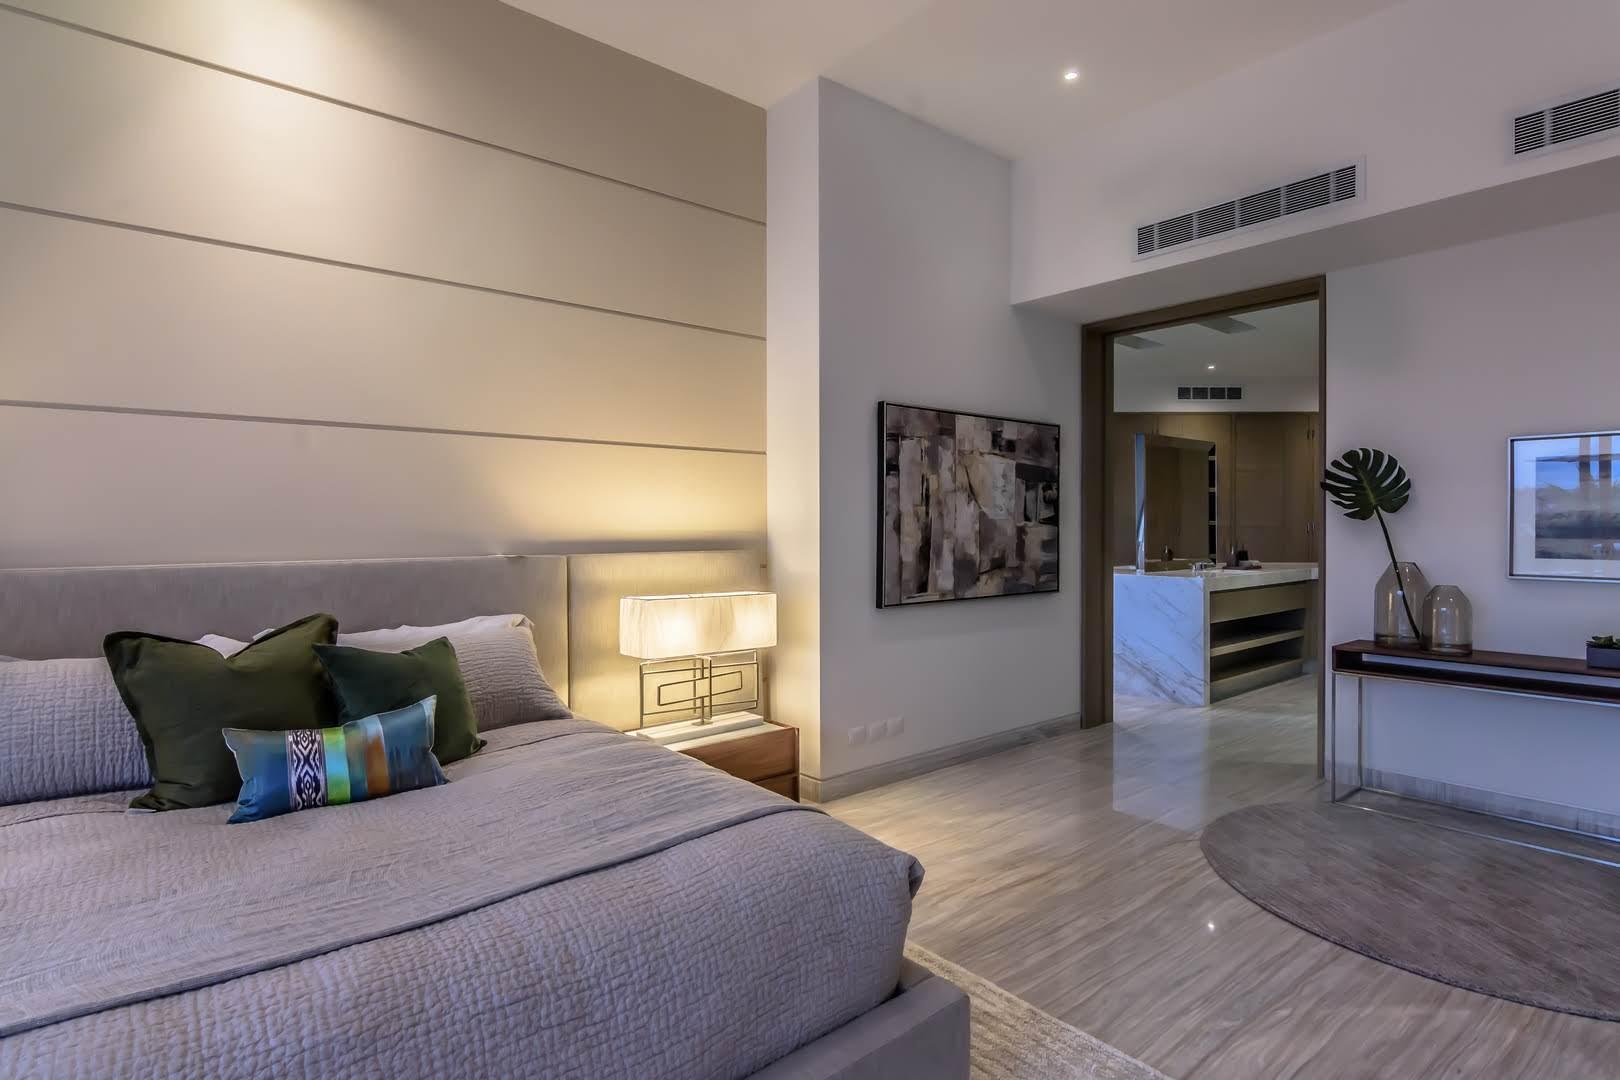 San Jose Corridor, 6 Bedrooms Bedrooms, ,6 BathroomsBathrooms,House,For Sale,Caleta,18-88